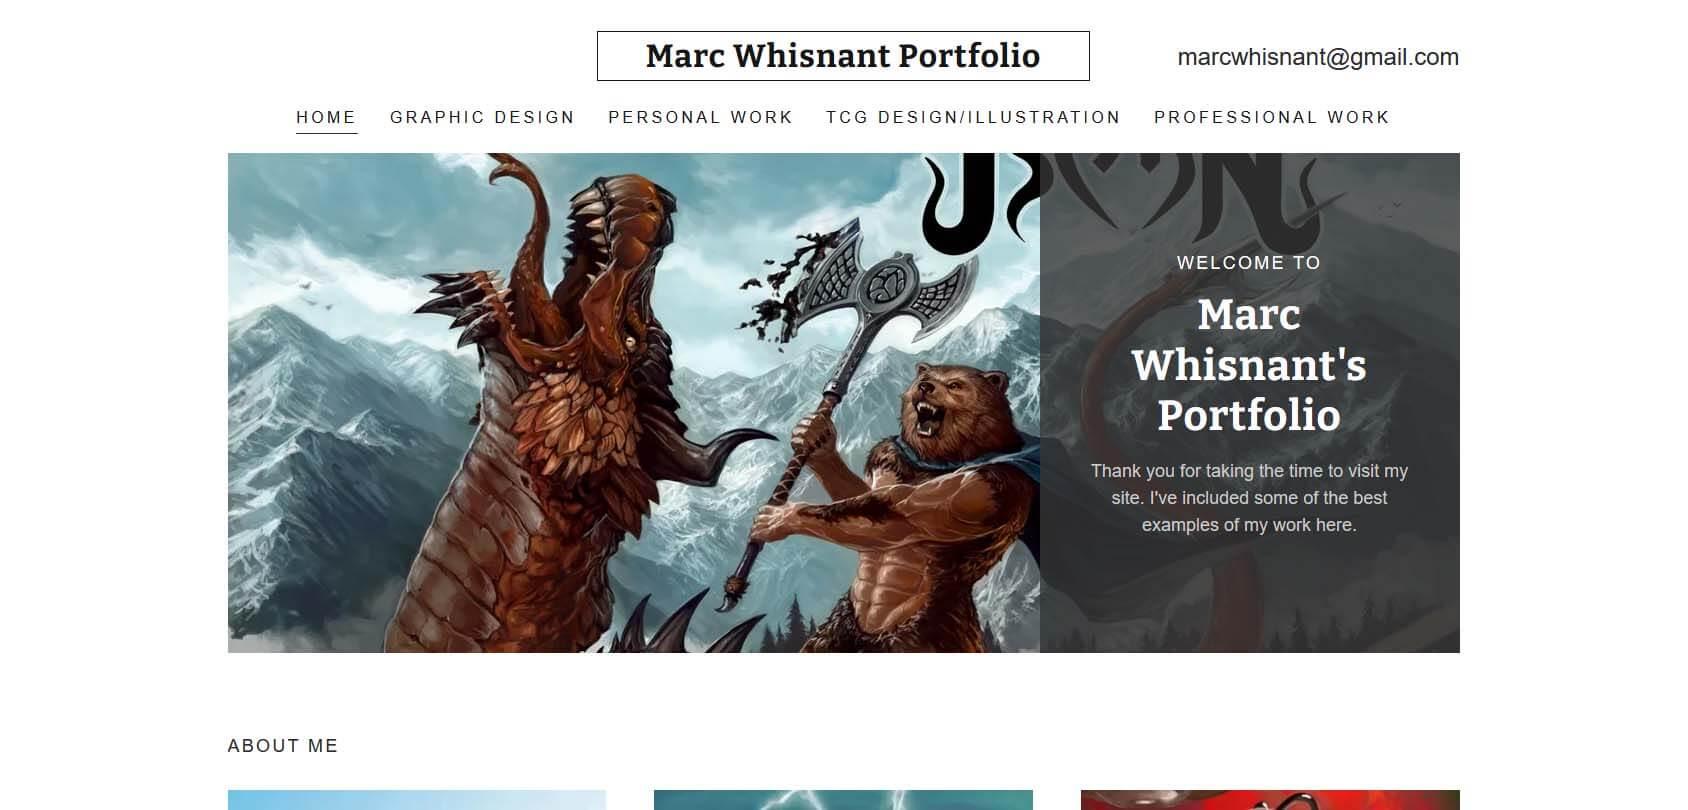 Marc Whisnant Portfolio Homepage